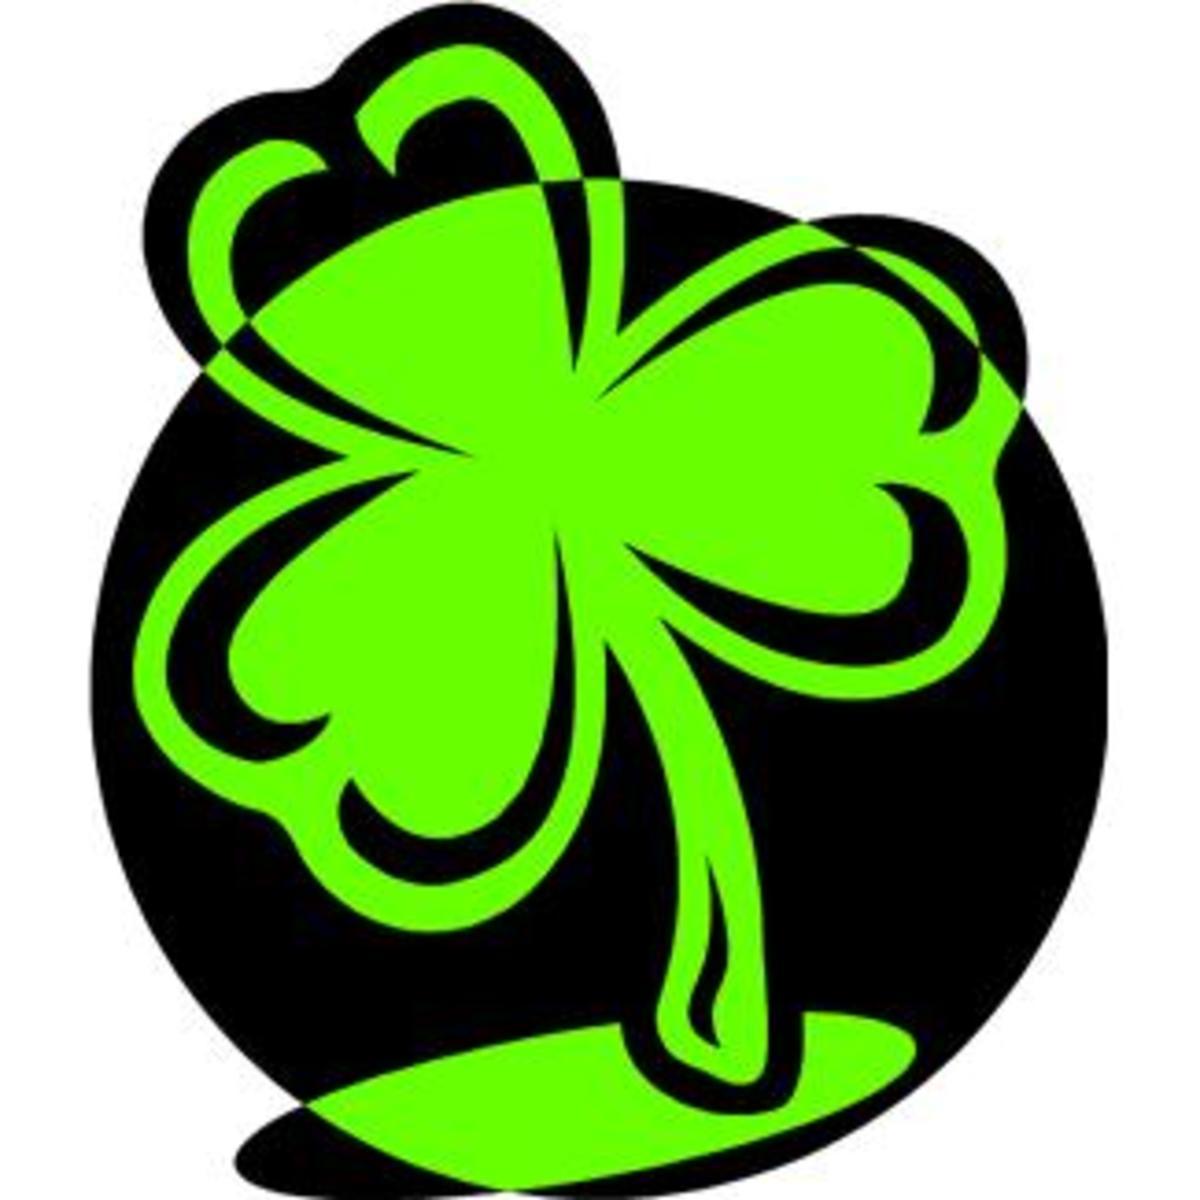 lime green fox racing logo